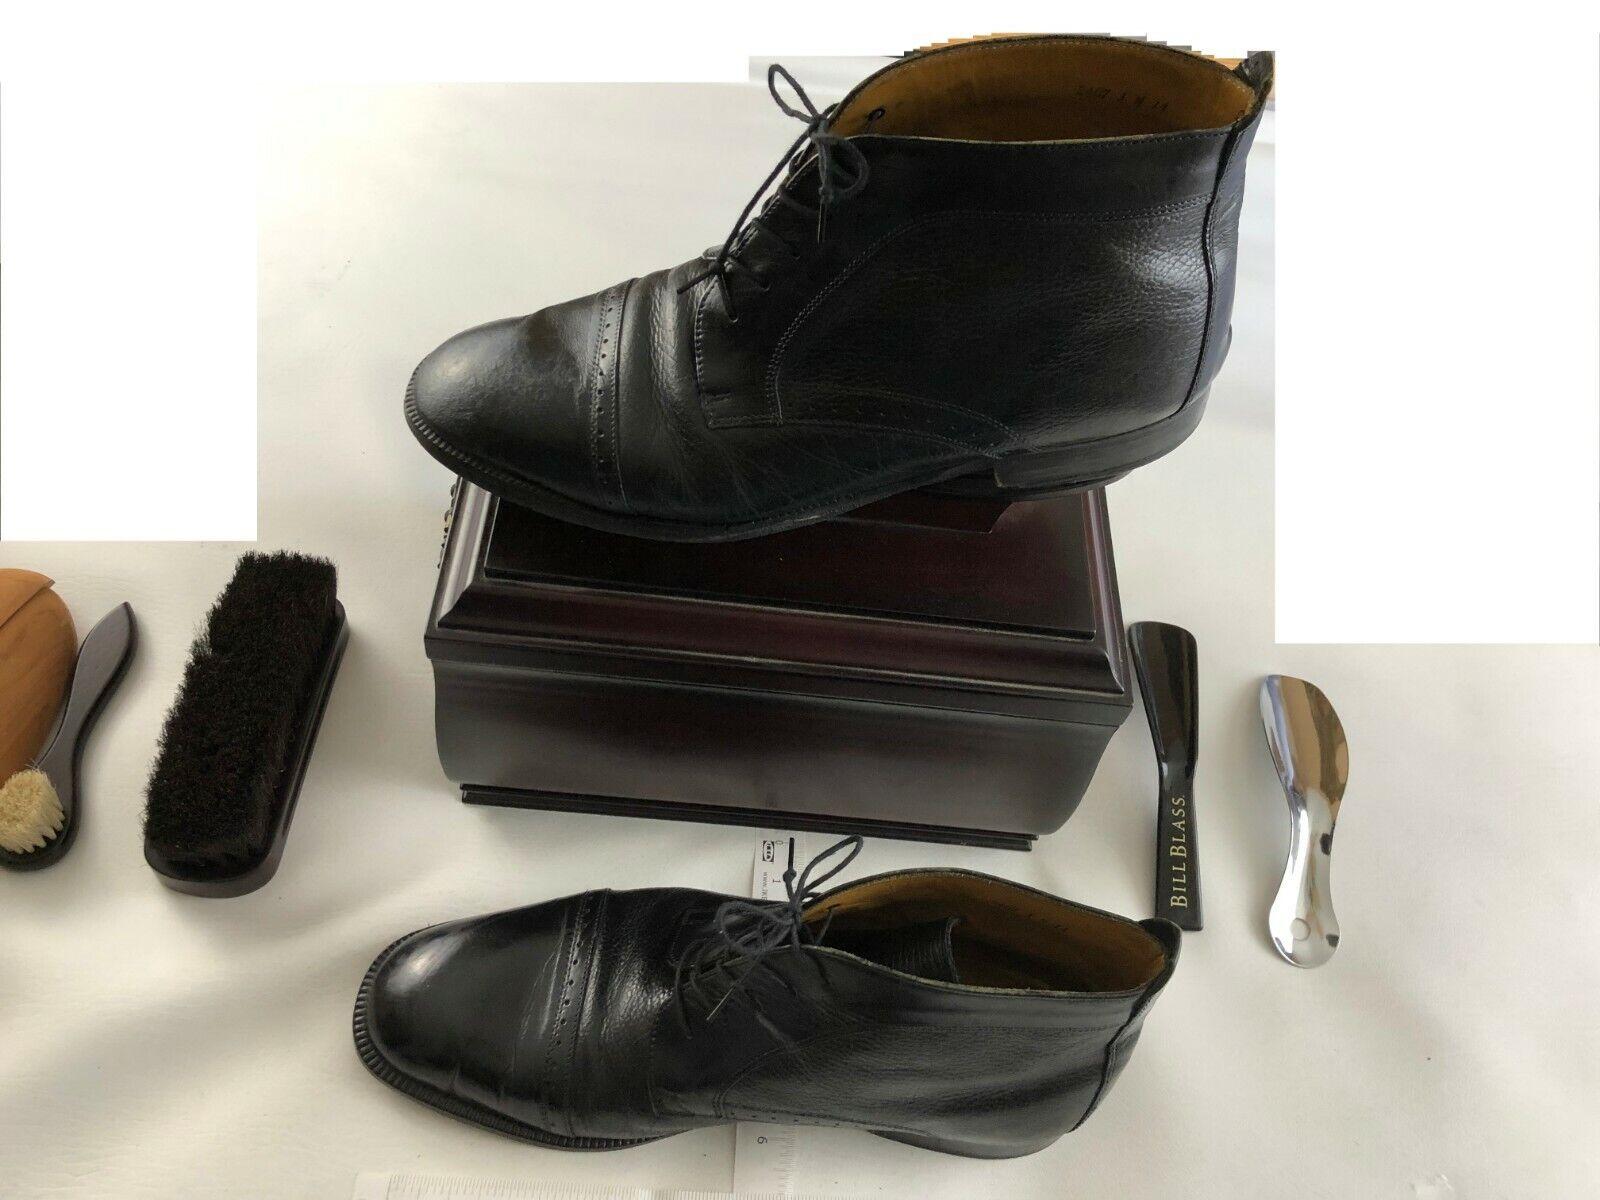 STANLEY BLACKER MEN'S DRESS BOOTS Size 14 M Genuine Leather Black